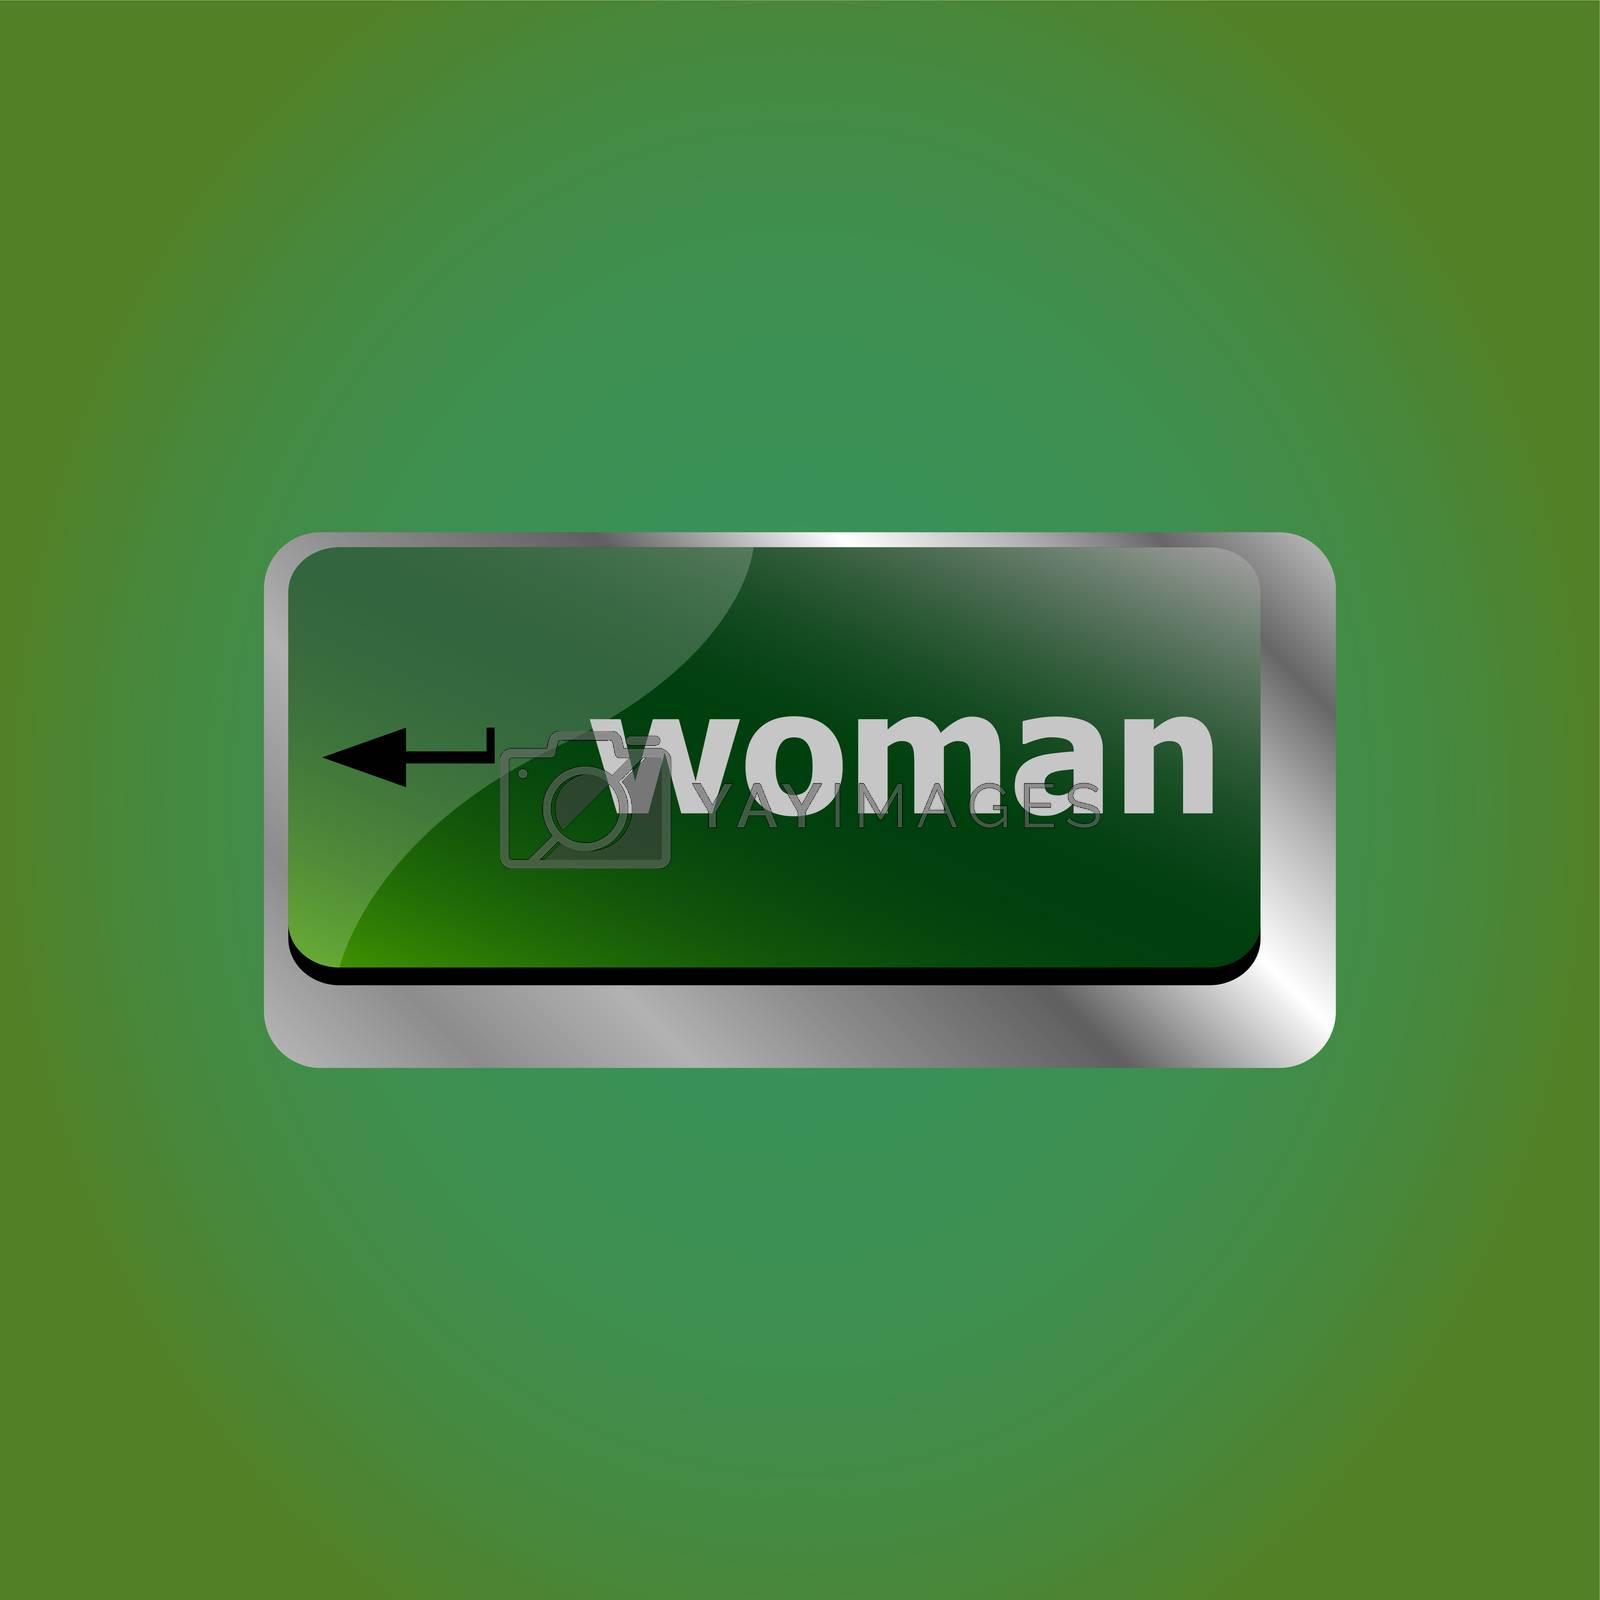 woman words on computer pc keyboard keys